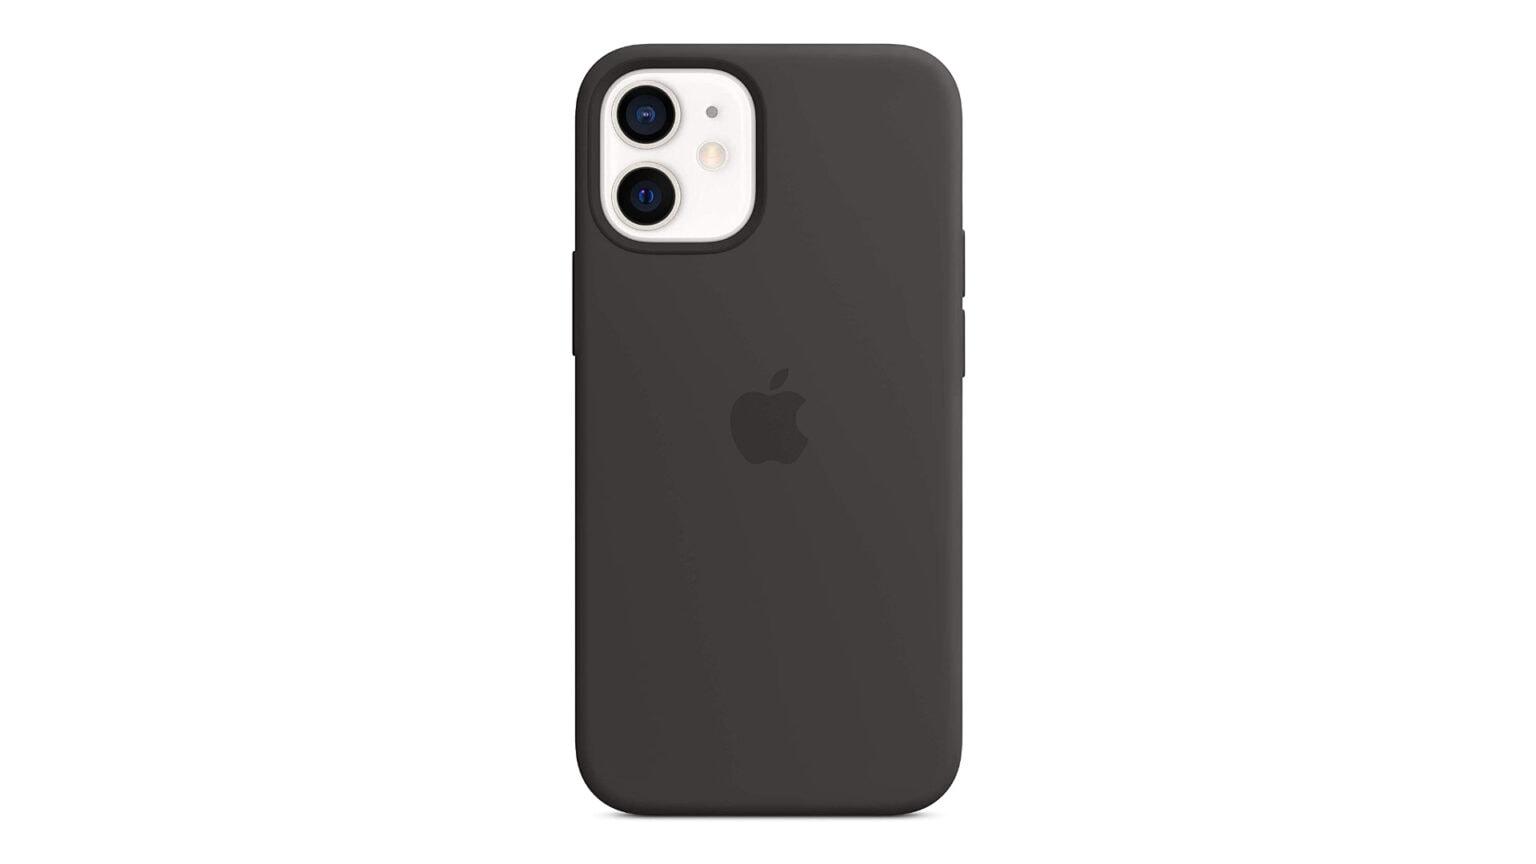 Apple Silicone Case for iPhone 12 mini